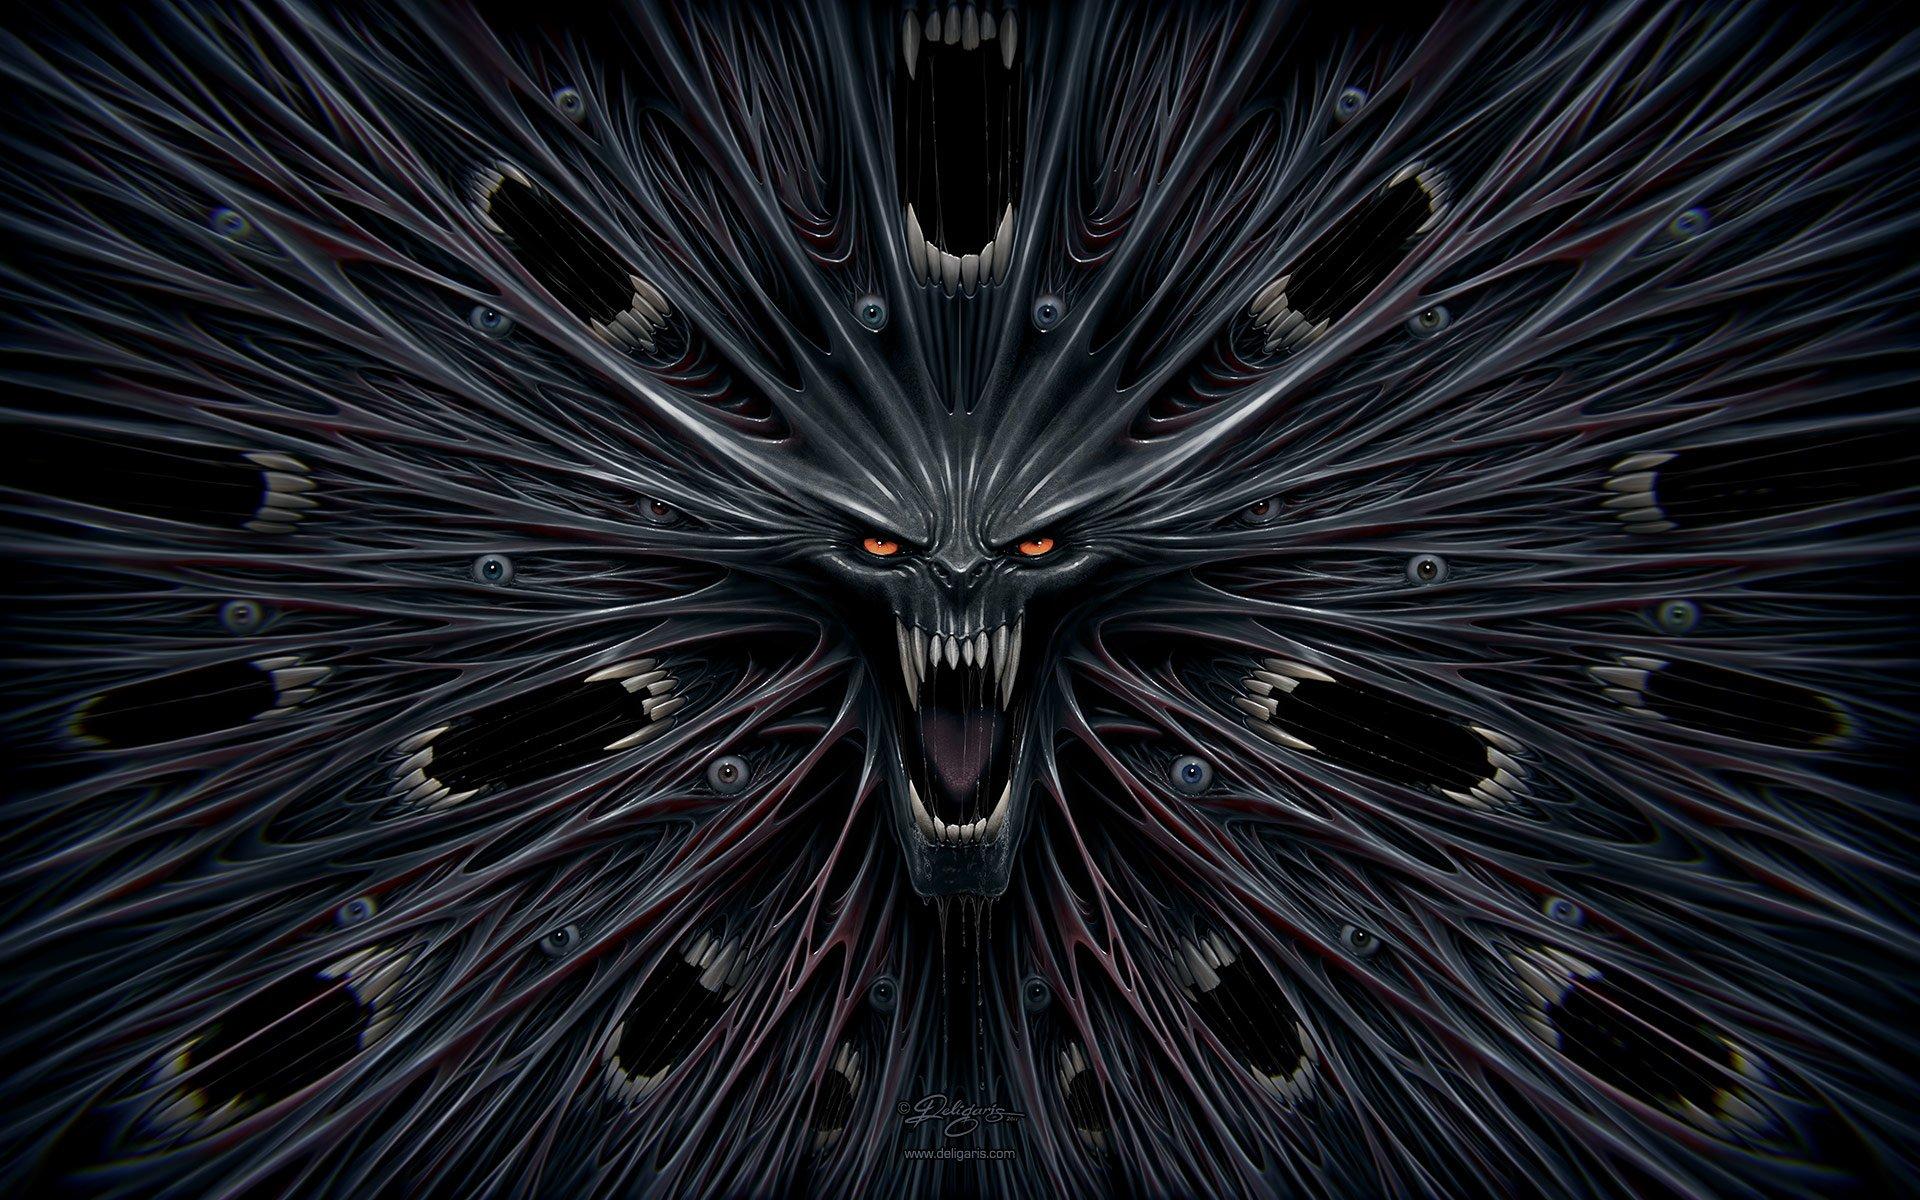 Dark - Artistic  Wallpaper